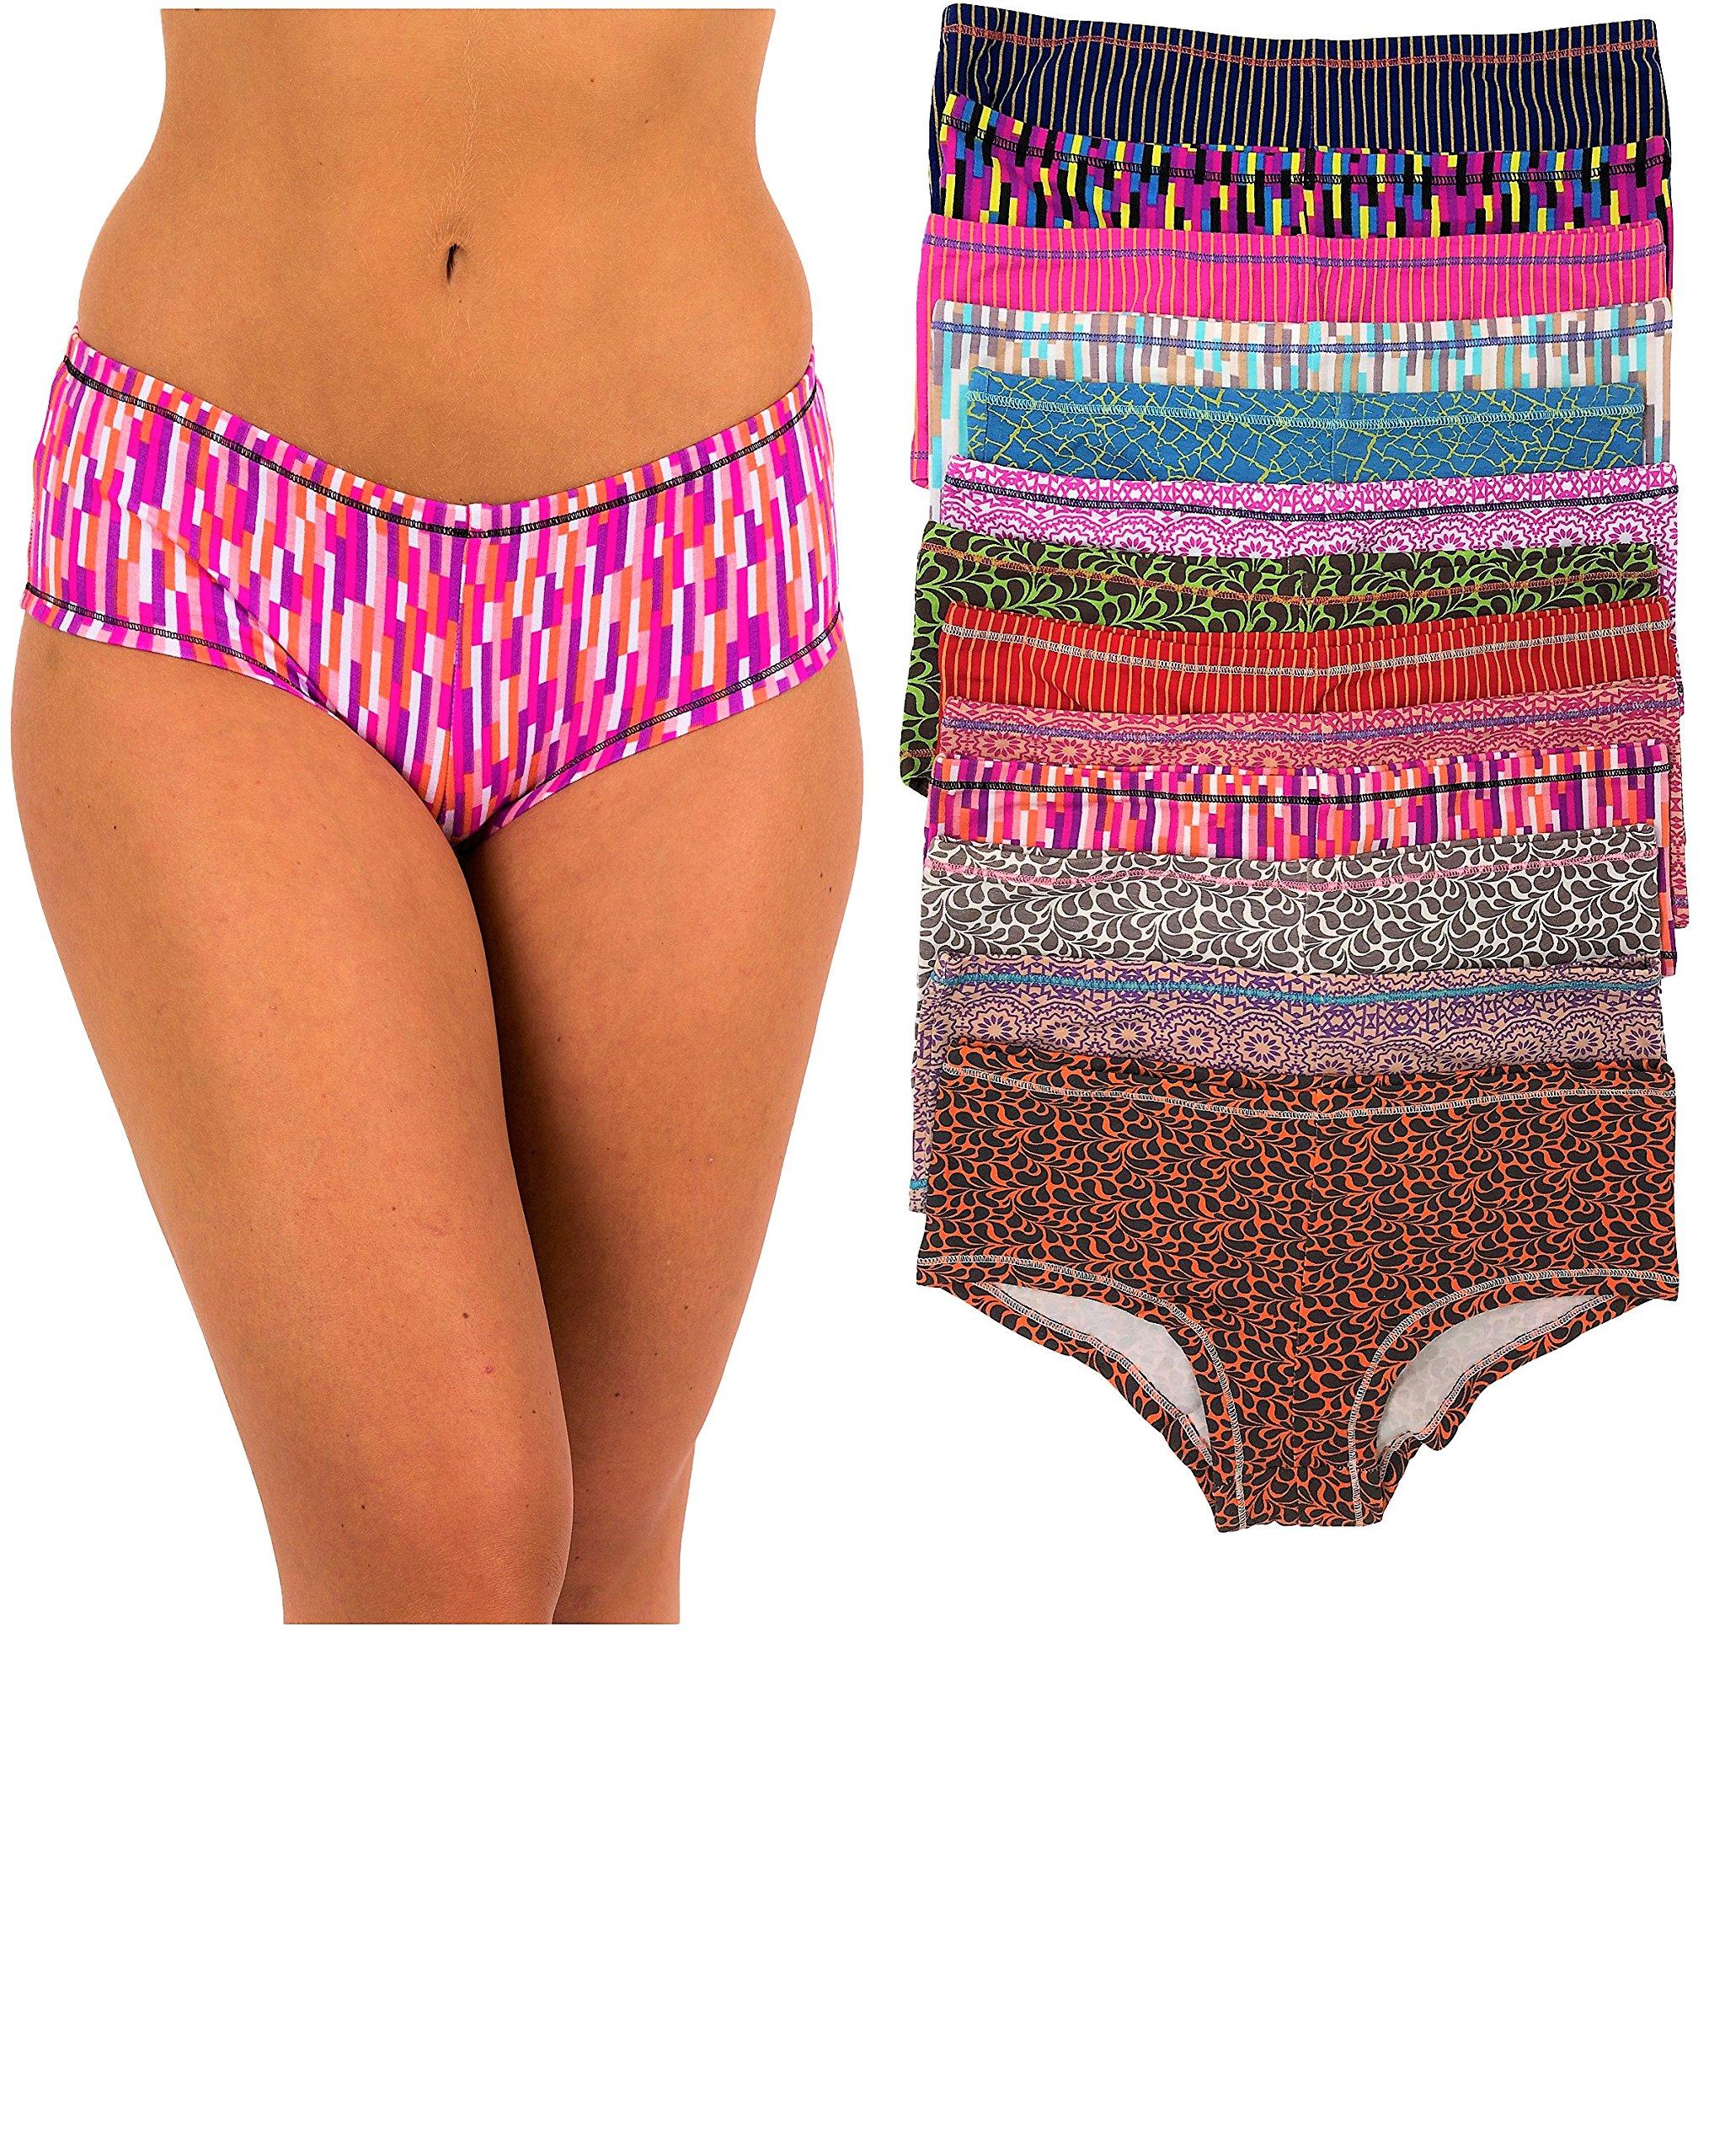 Sexy Basics Women's 12 Pack Cotton Spandex Active Wear Boy Shorts Panty Briefs